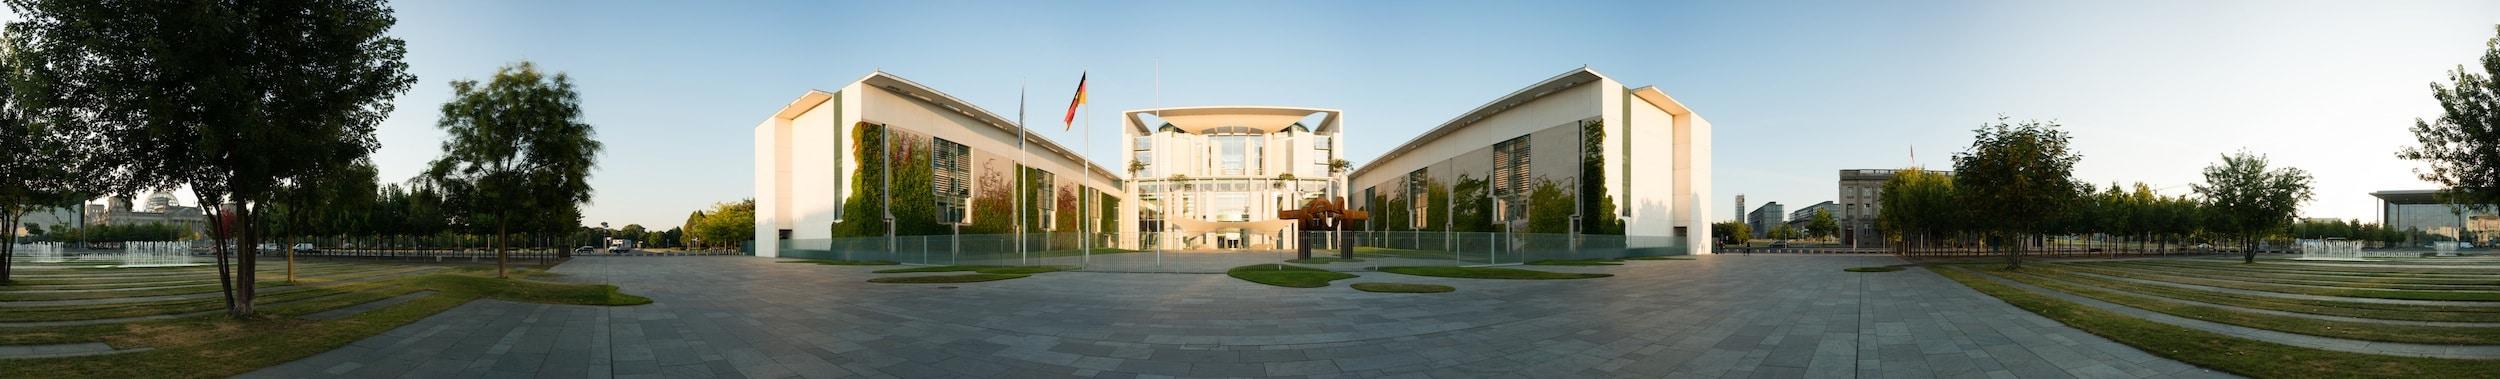 Panorama Kanzleramt (360 Grad), (Foto copyright - Frank Weber - Berlin - www.fotologbuch.de)